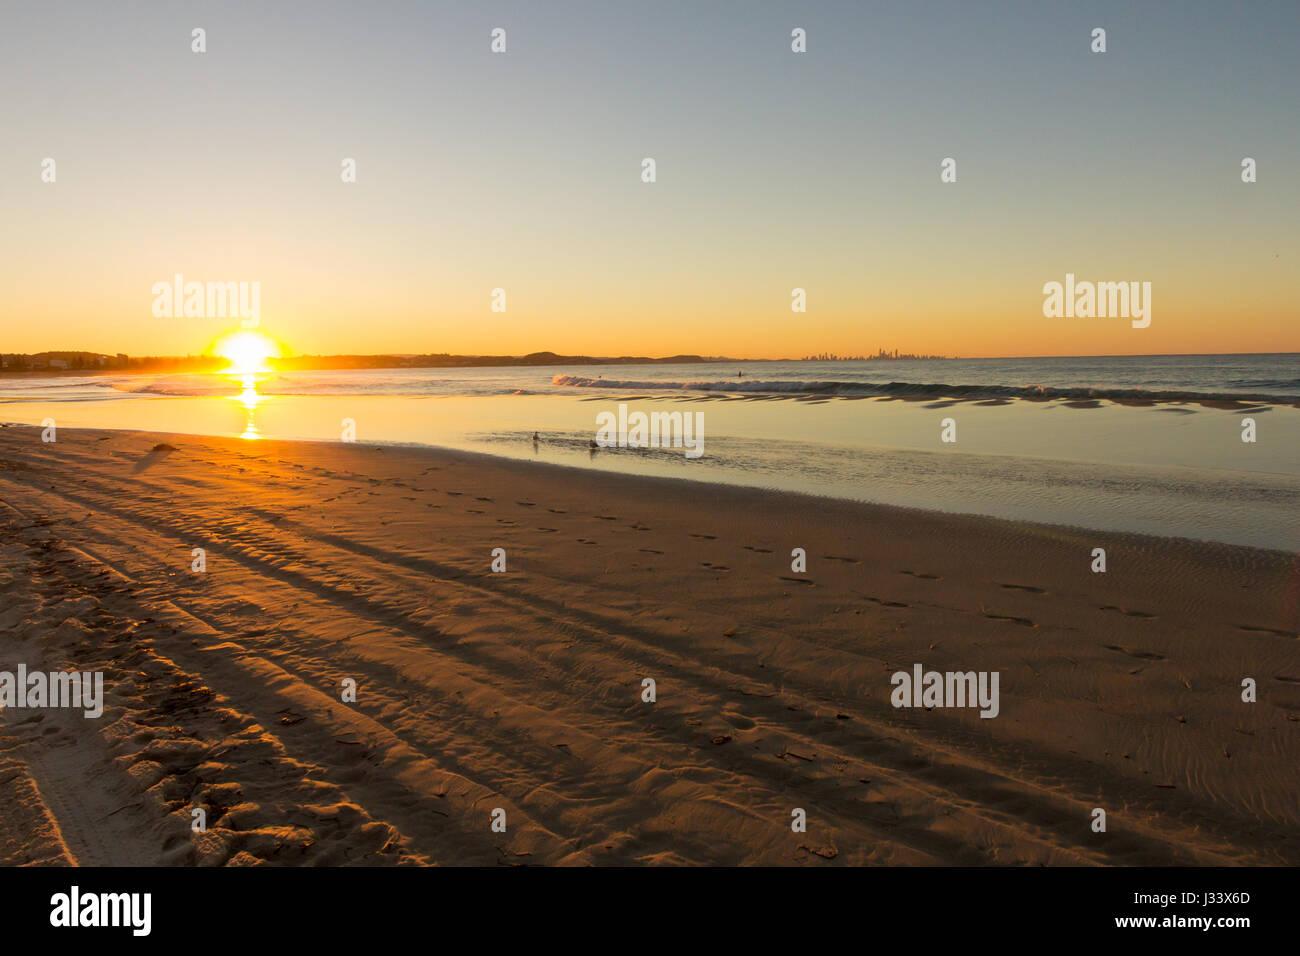 1c1beda36df Coolangatta Beach Stock Photos   Coolangatta Beach Stock Images - Alamy